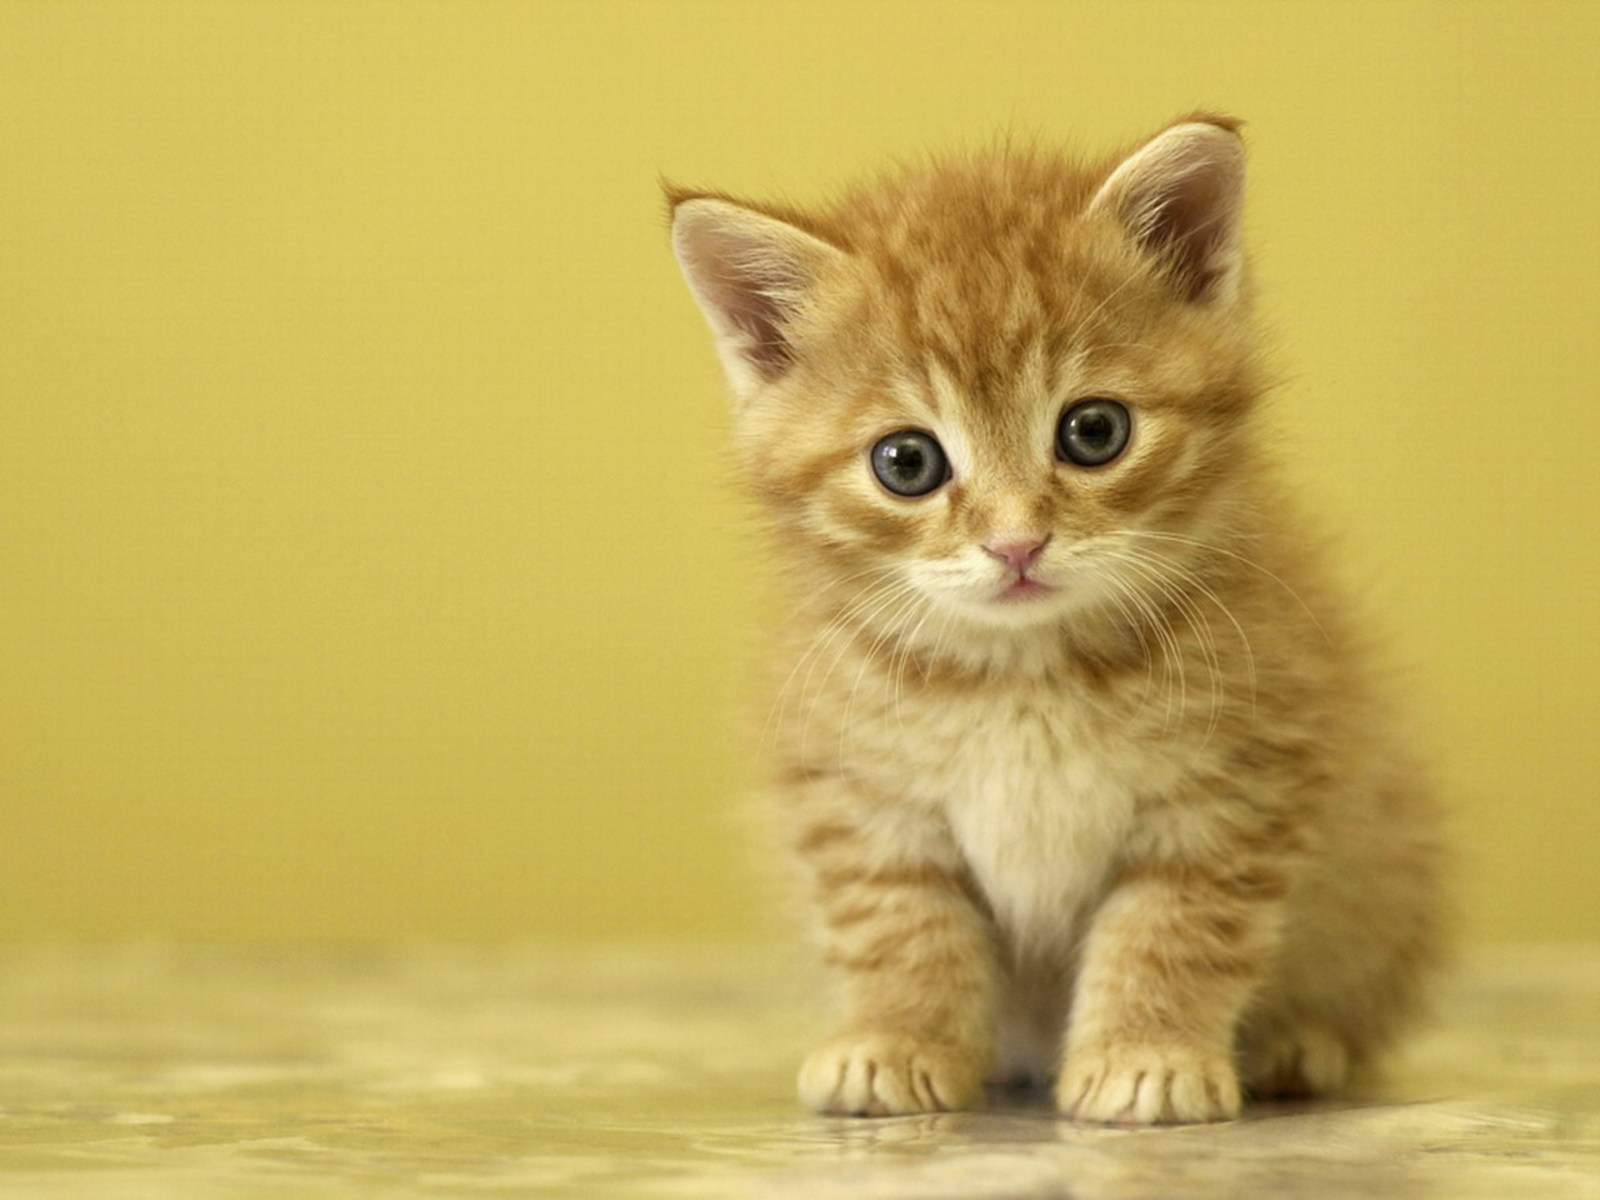 http://3.bp.blogspot.com/-lnIFdAuZKbk/TjPbfsYu9MI/AAAAAAAAAhU/Z39c1_q-xs4/s1600/kucing+comel+5.jpg